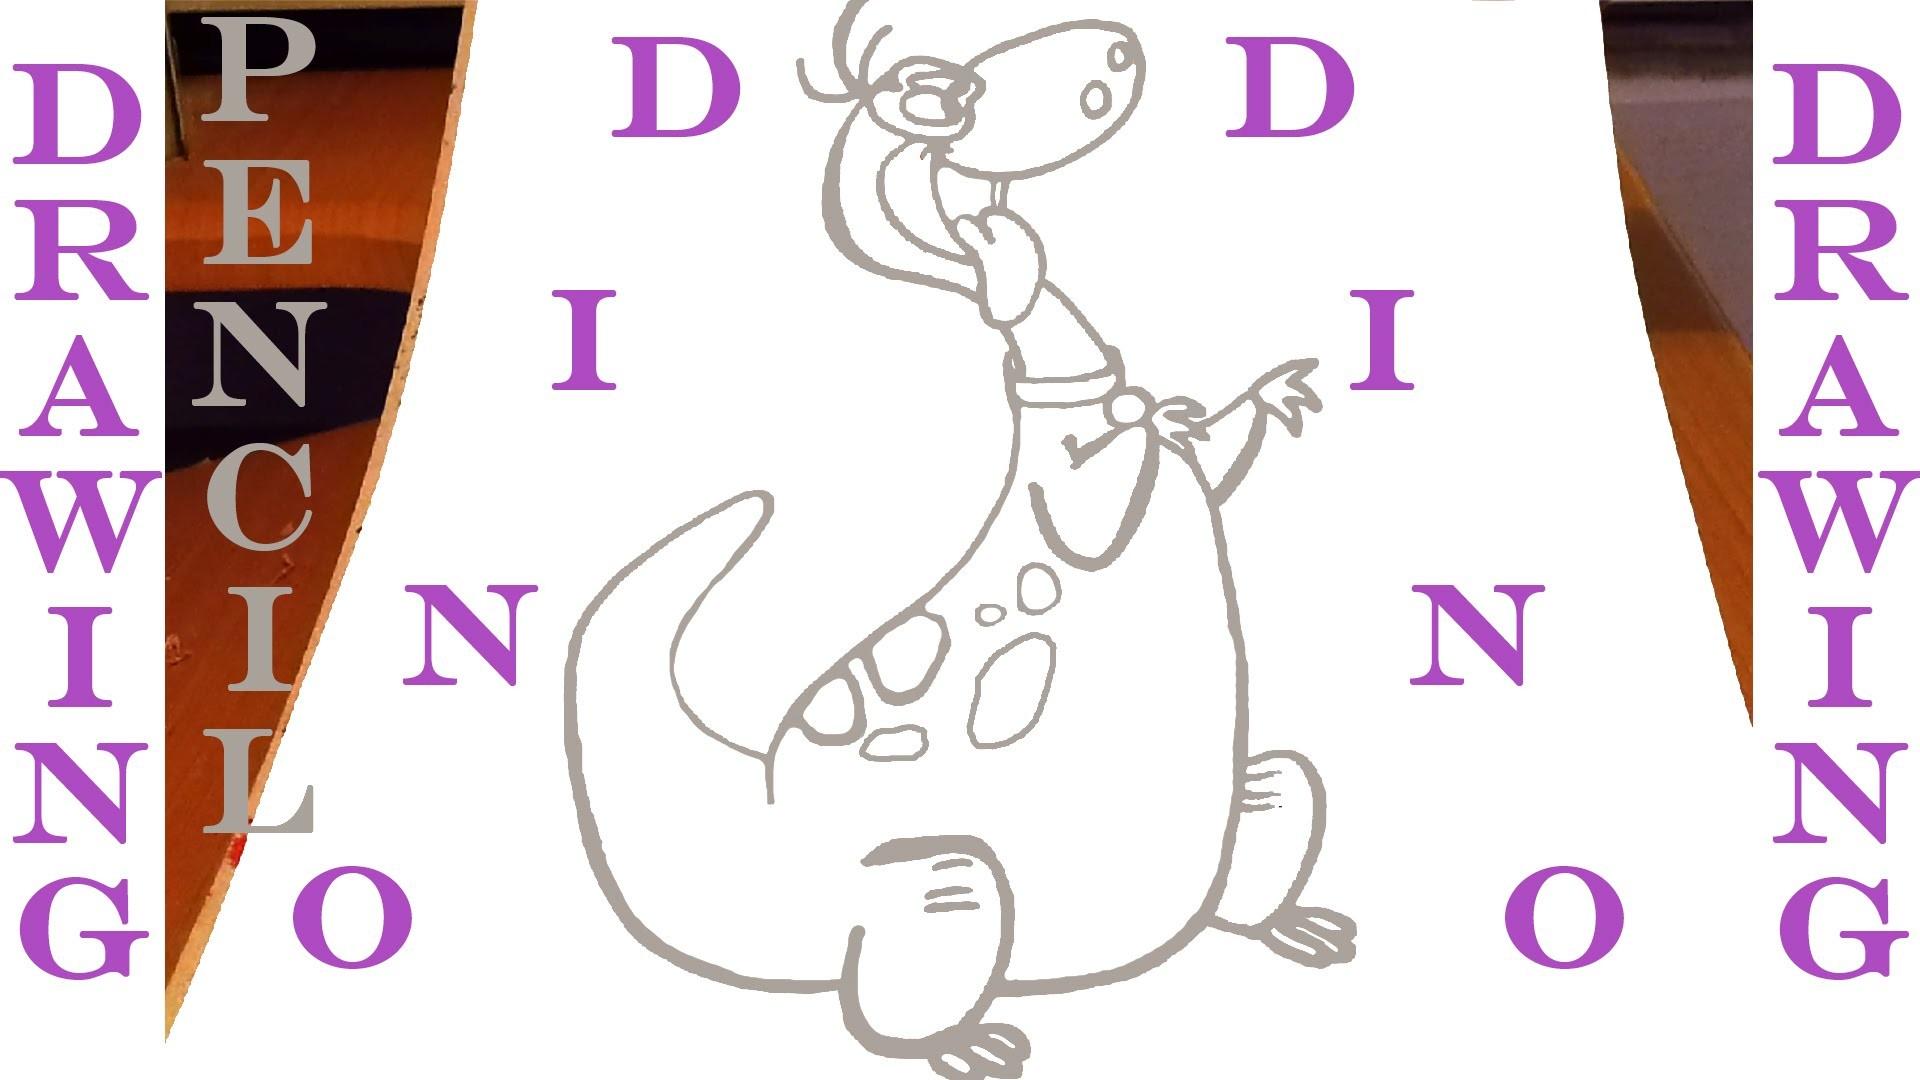 How to draw a Dinosaur DINO Easy - The Flintstones - Cartoon Network   PENCIL   SPEEDY